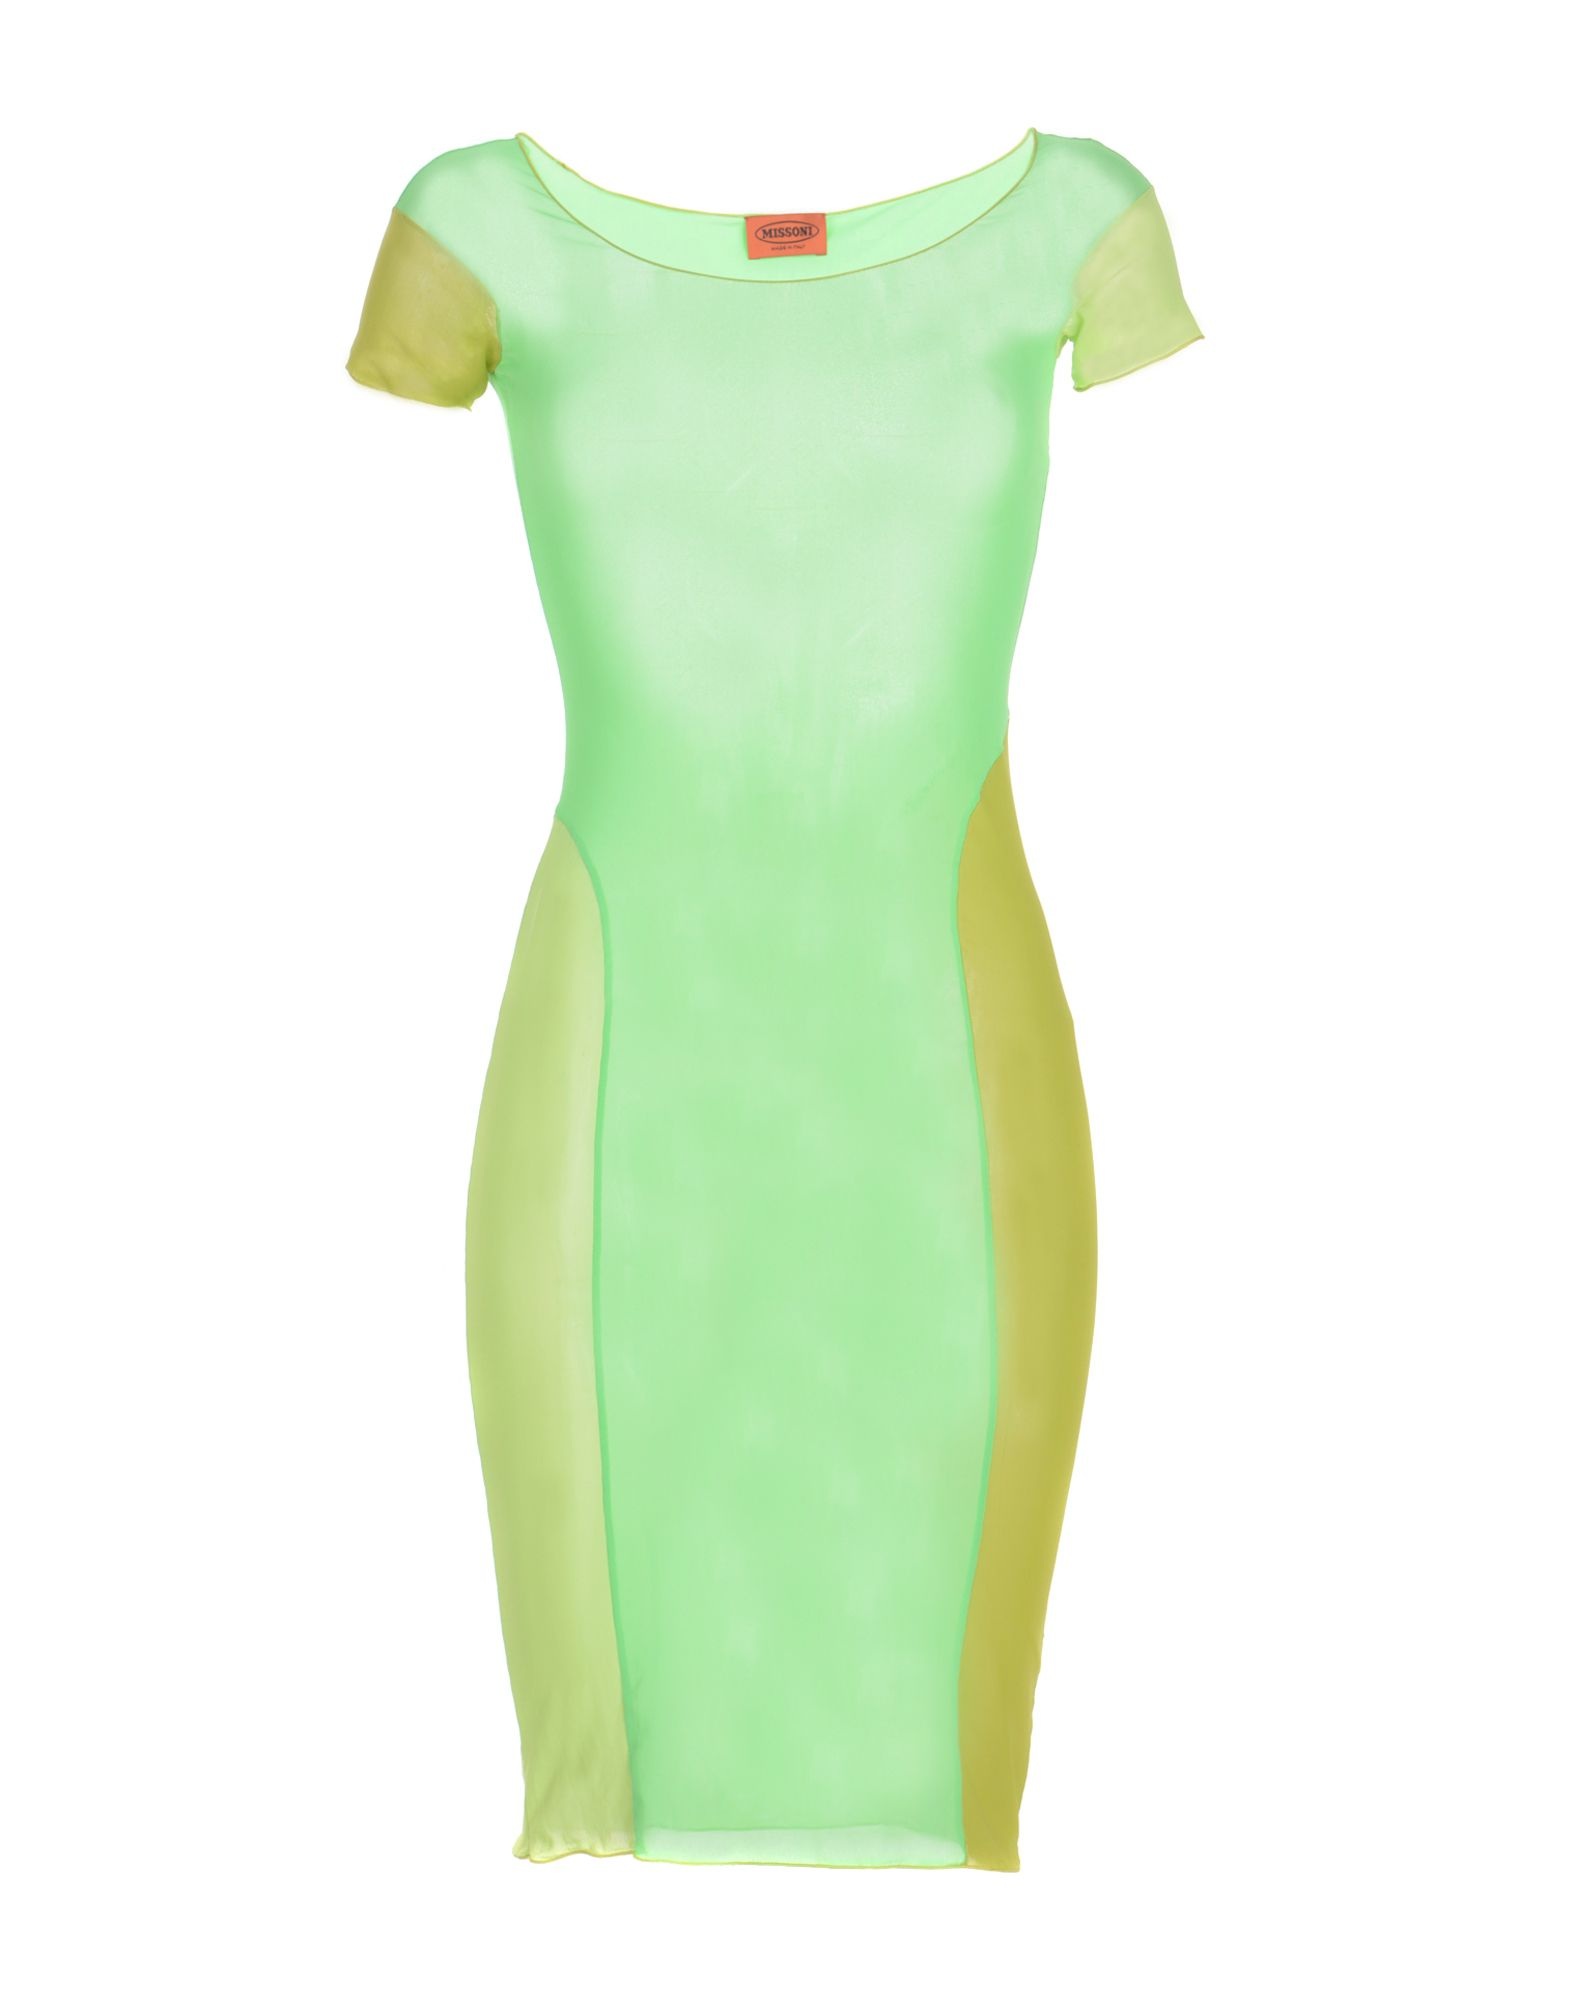 2c1c0859ac Missoni Short Dress - Women Missoni Short Dresses online on YOOX ...